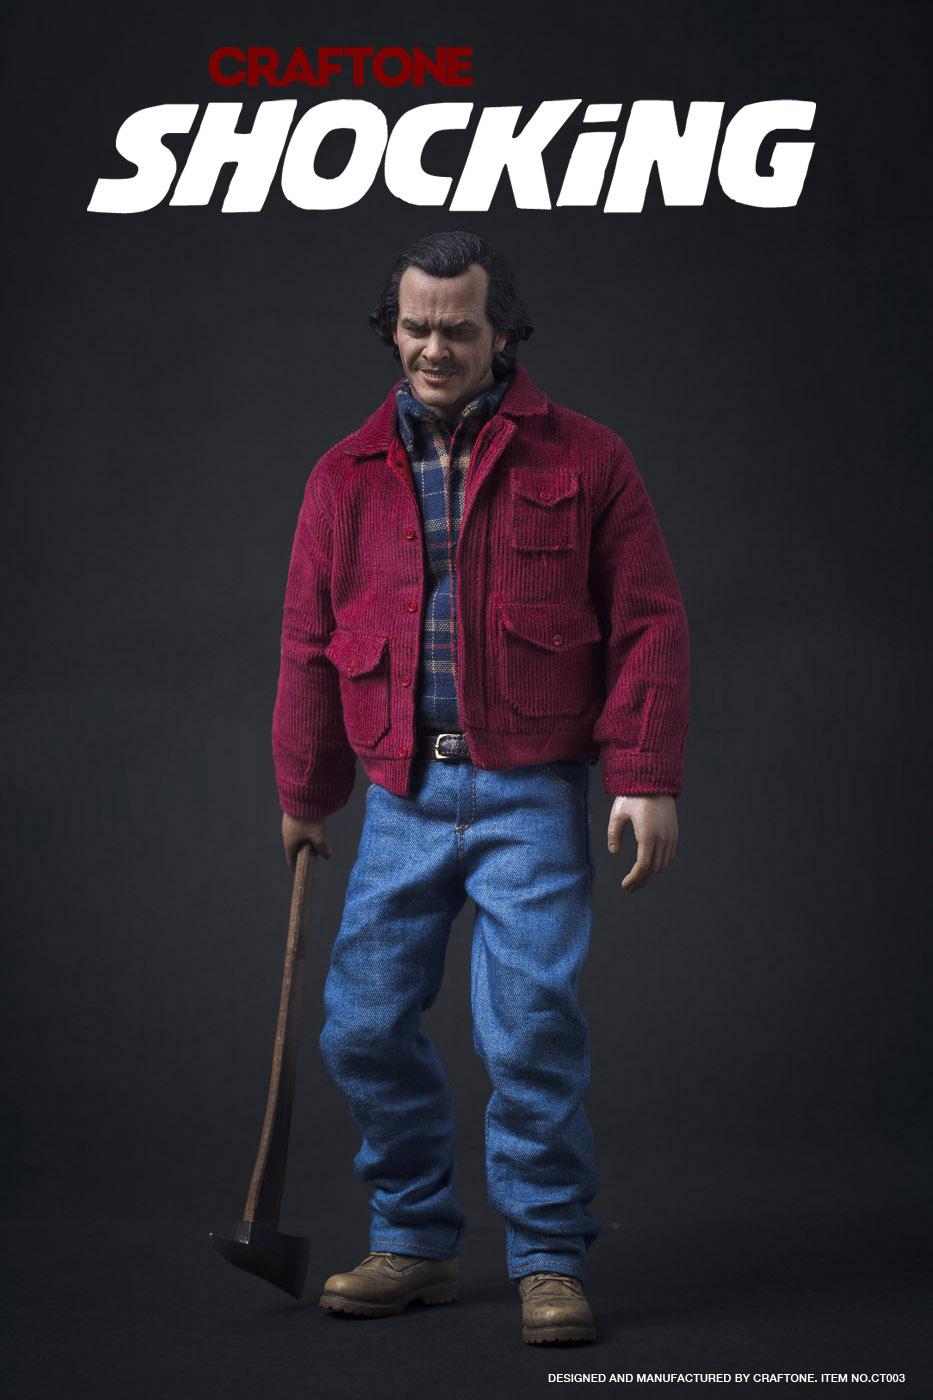 [Craftone] Shocking - Jack Torrance 1/6 scale 183848qgxgxxx2ot1b5o5b